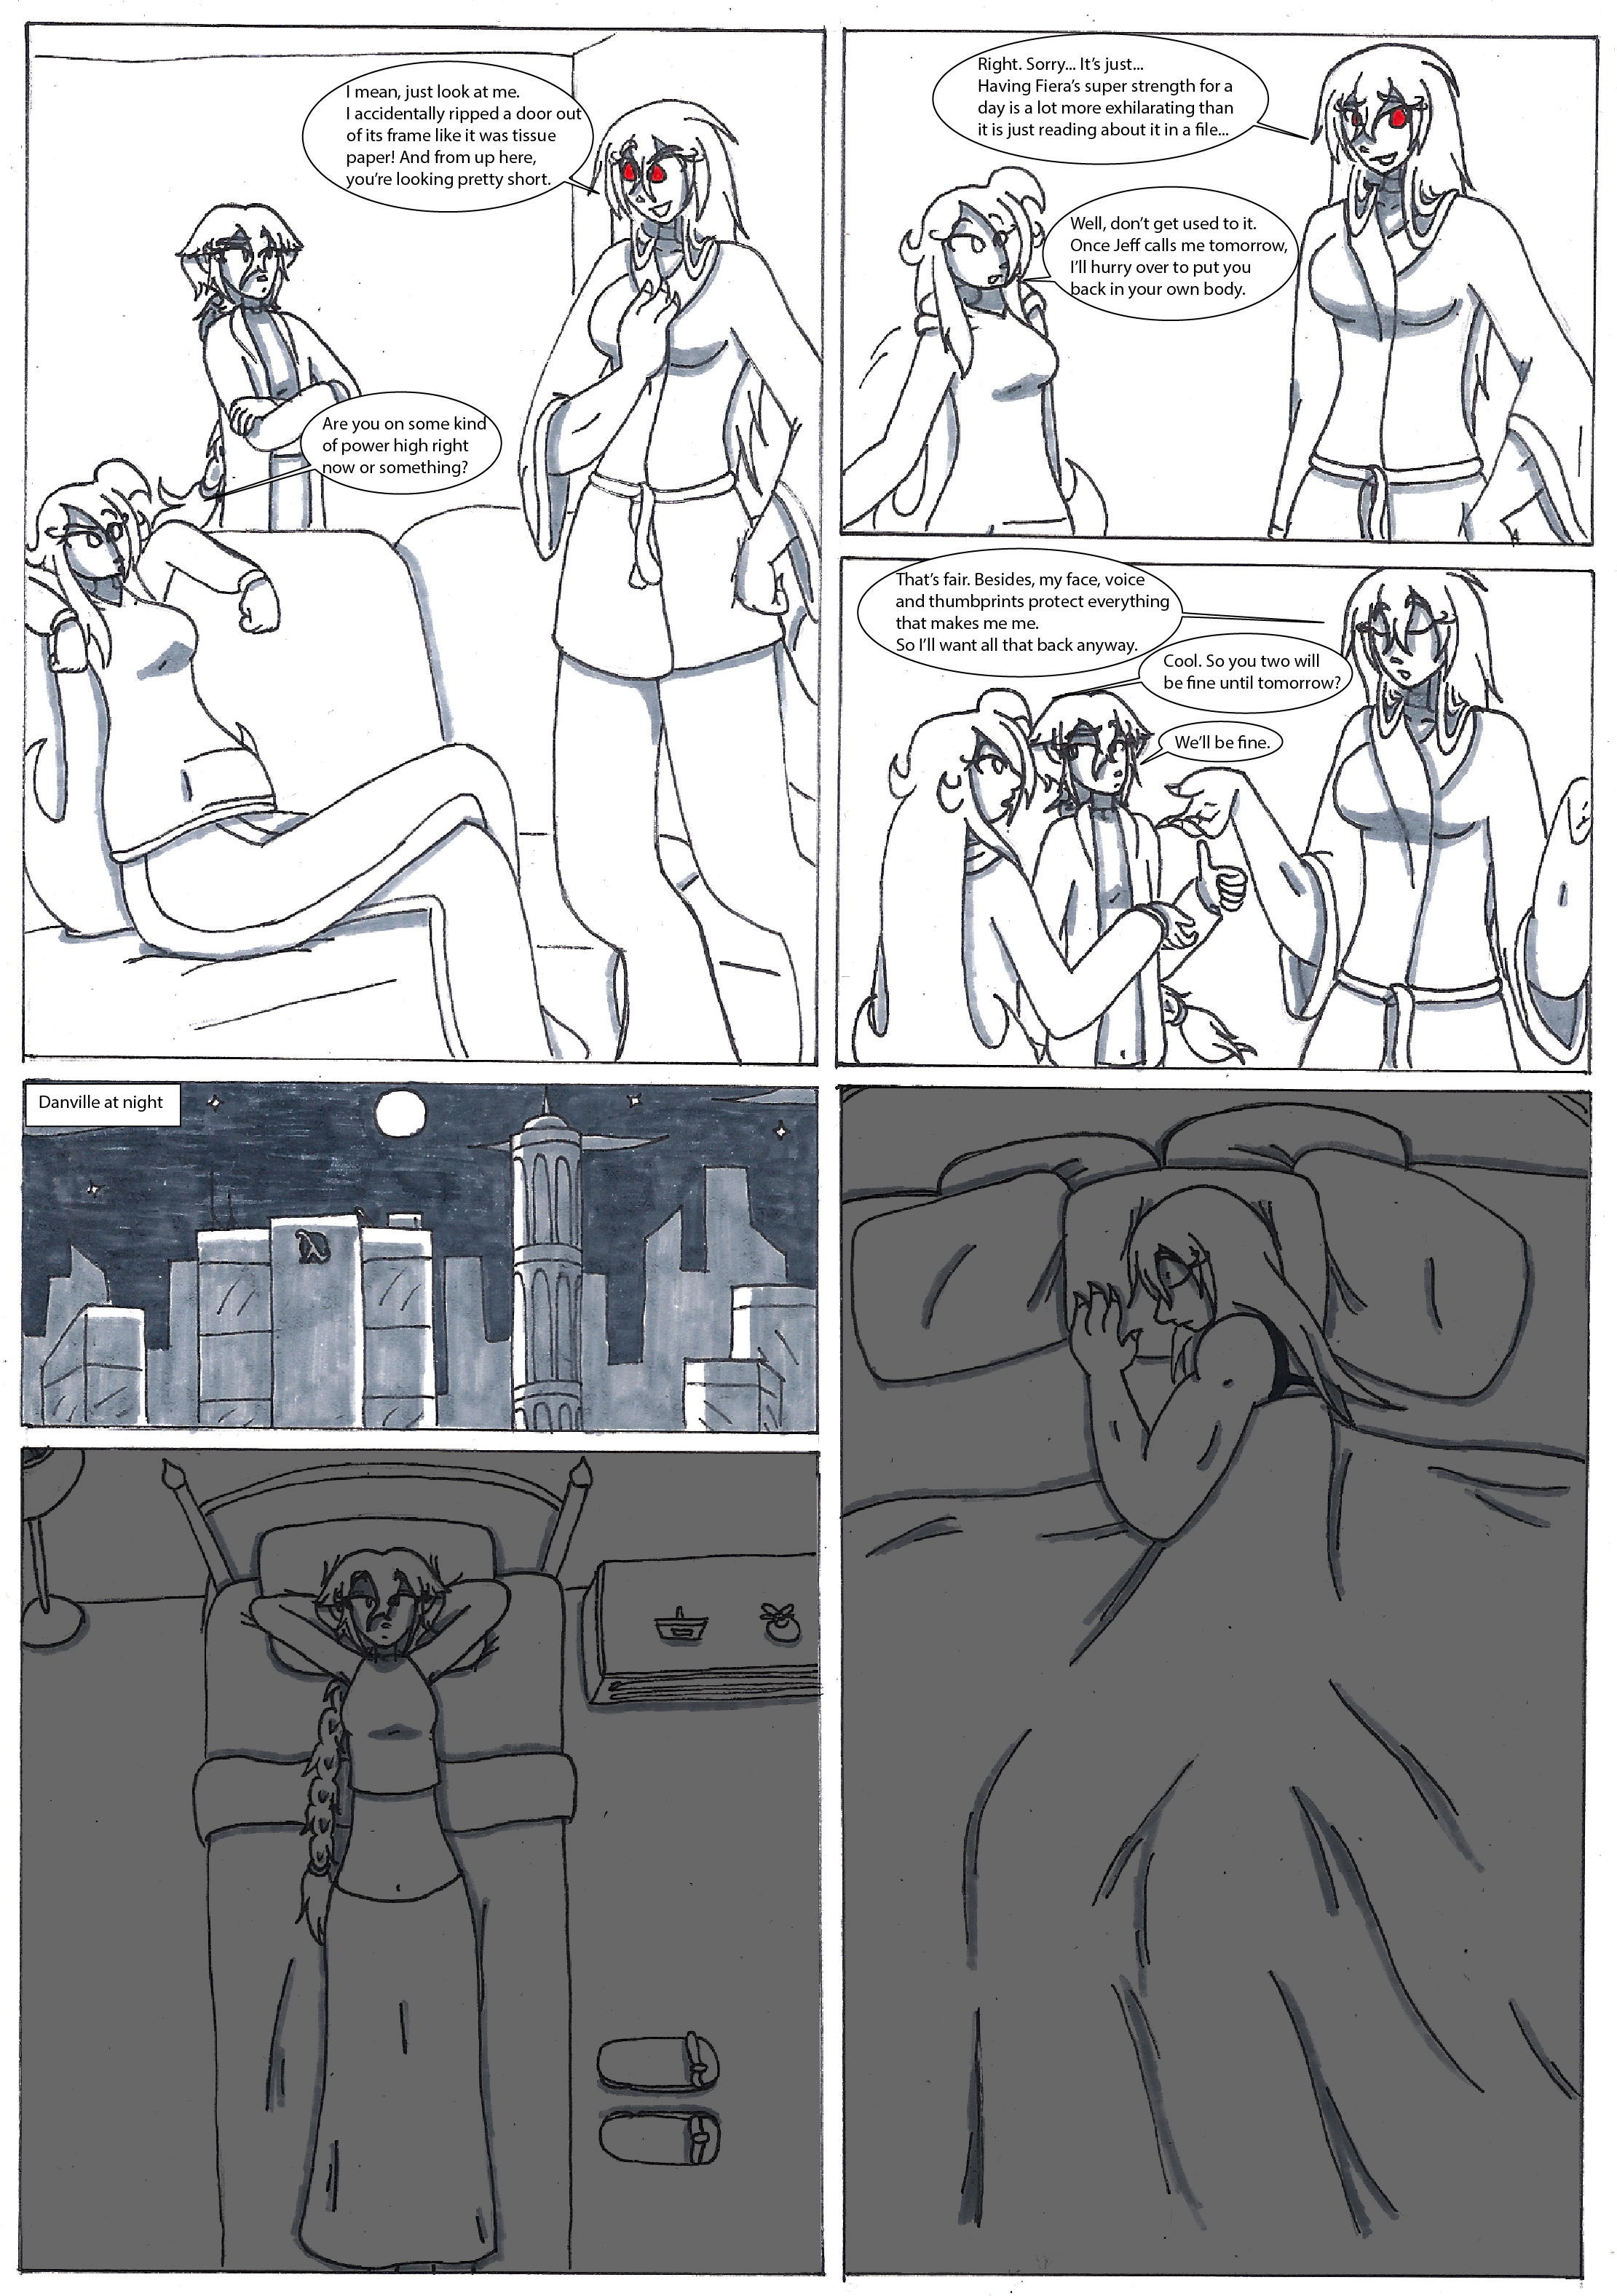 S02-14 by misterj02